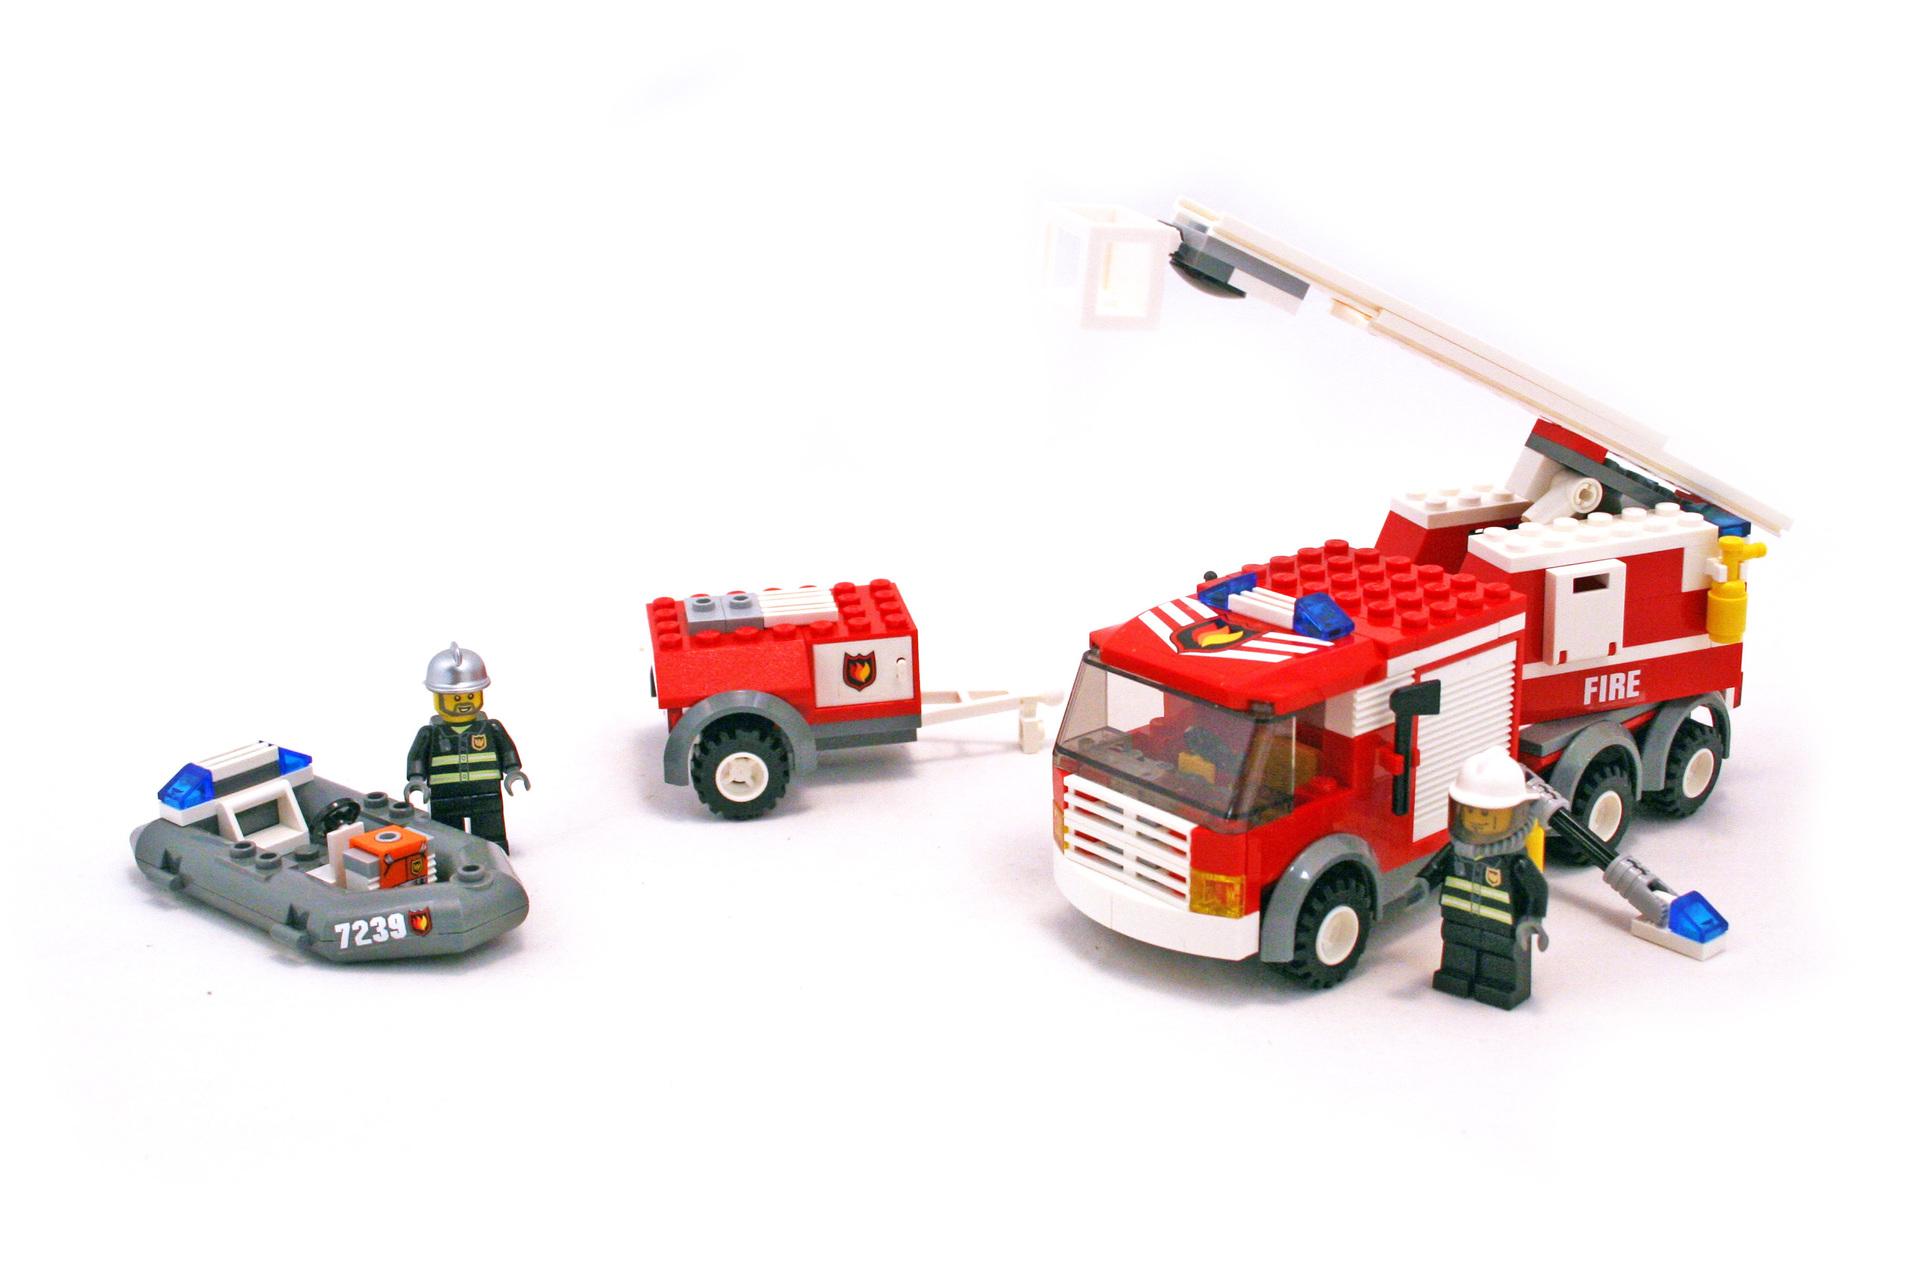 Fire Truck - LEGO set #7239-1 (Building Sets > City > Fire)